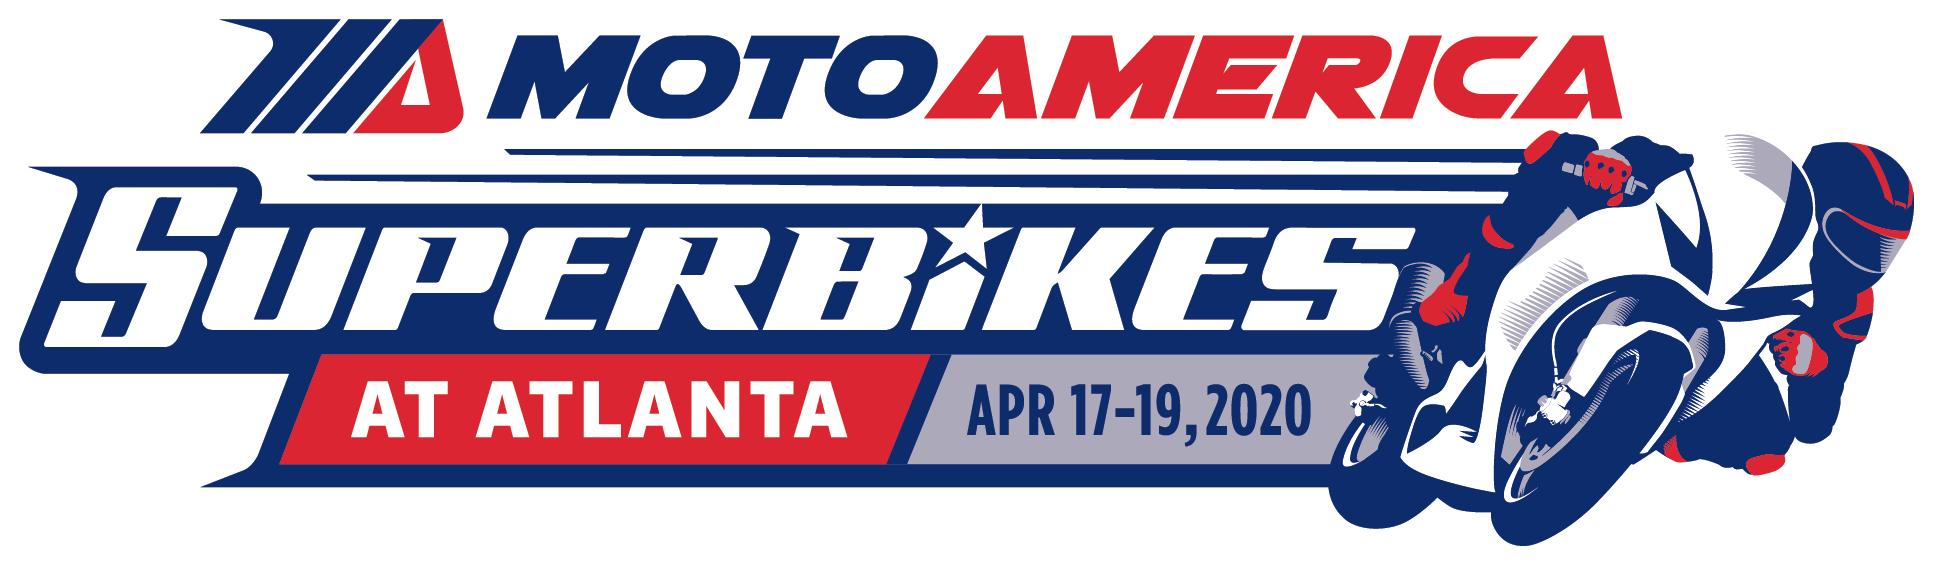 MotoAmerica Superbikes at Atlanta - April 17-19, 2020